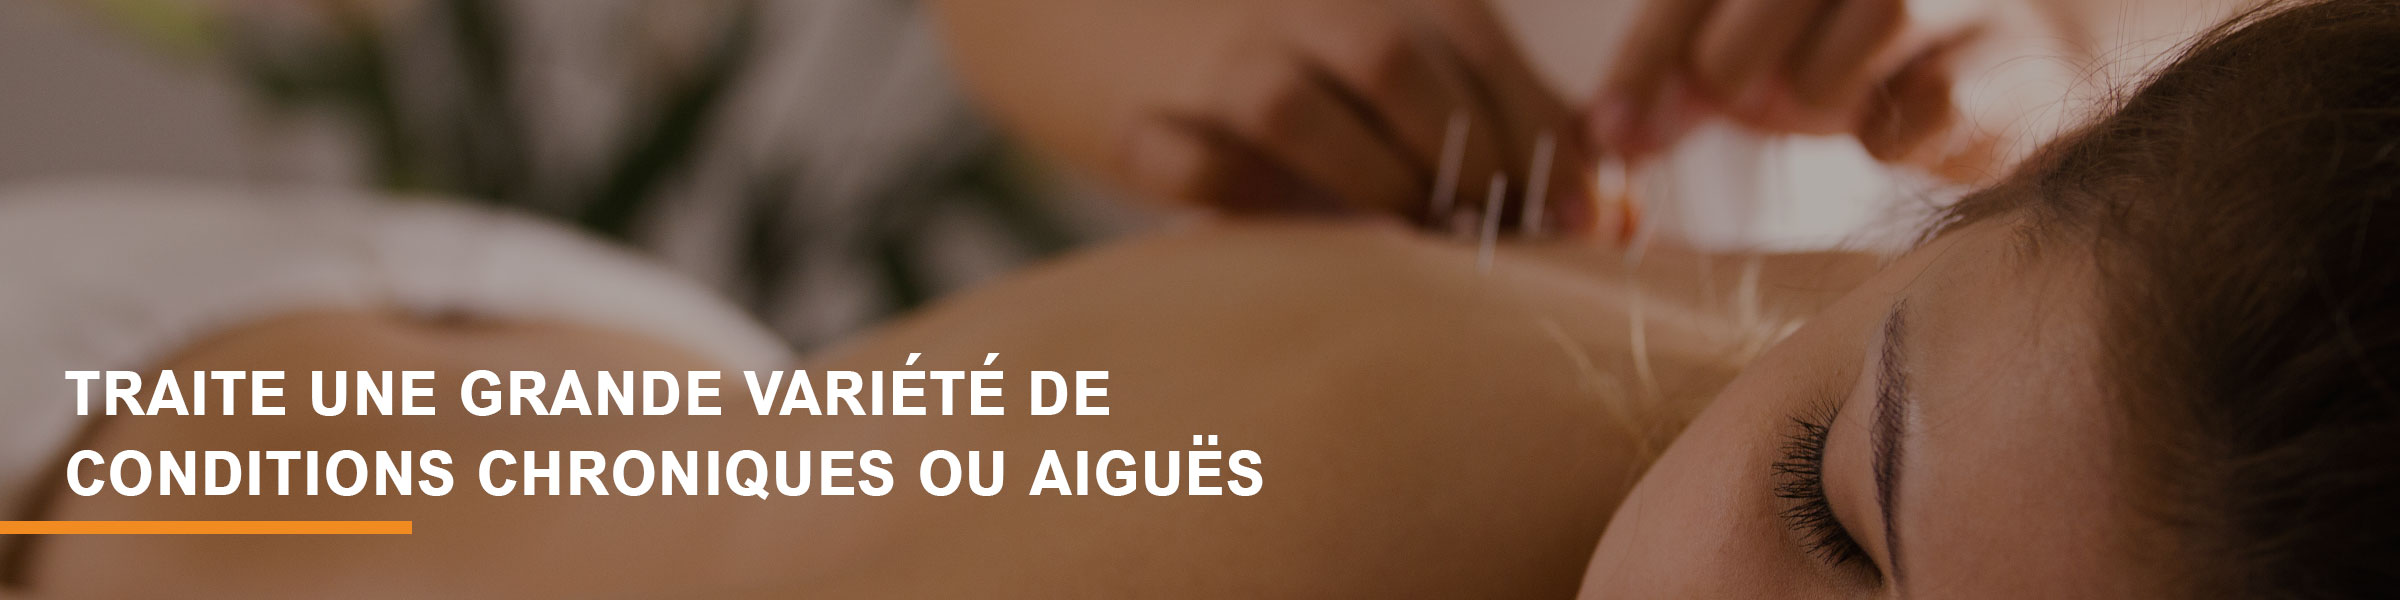 https://cliniquepraxis.ca/wp-content/uploads/2020/10/corps-femme-acupuncture.jpg